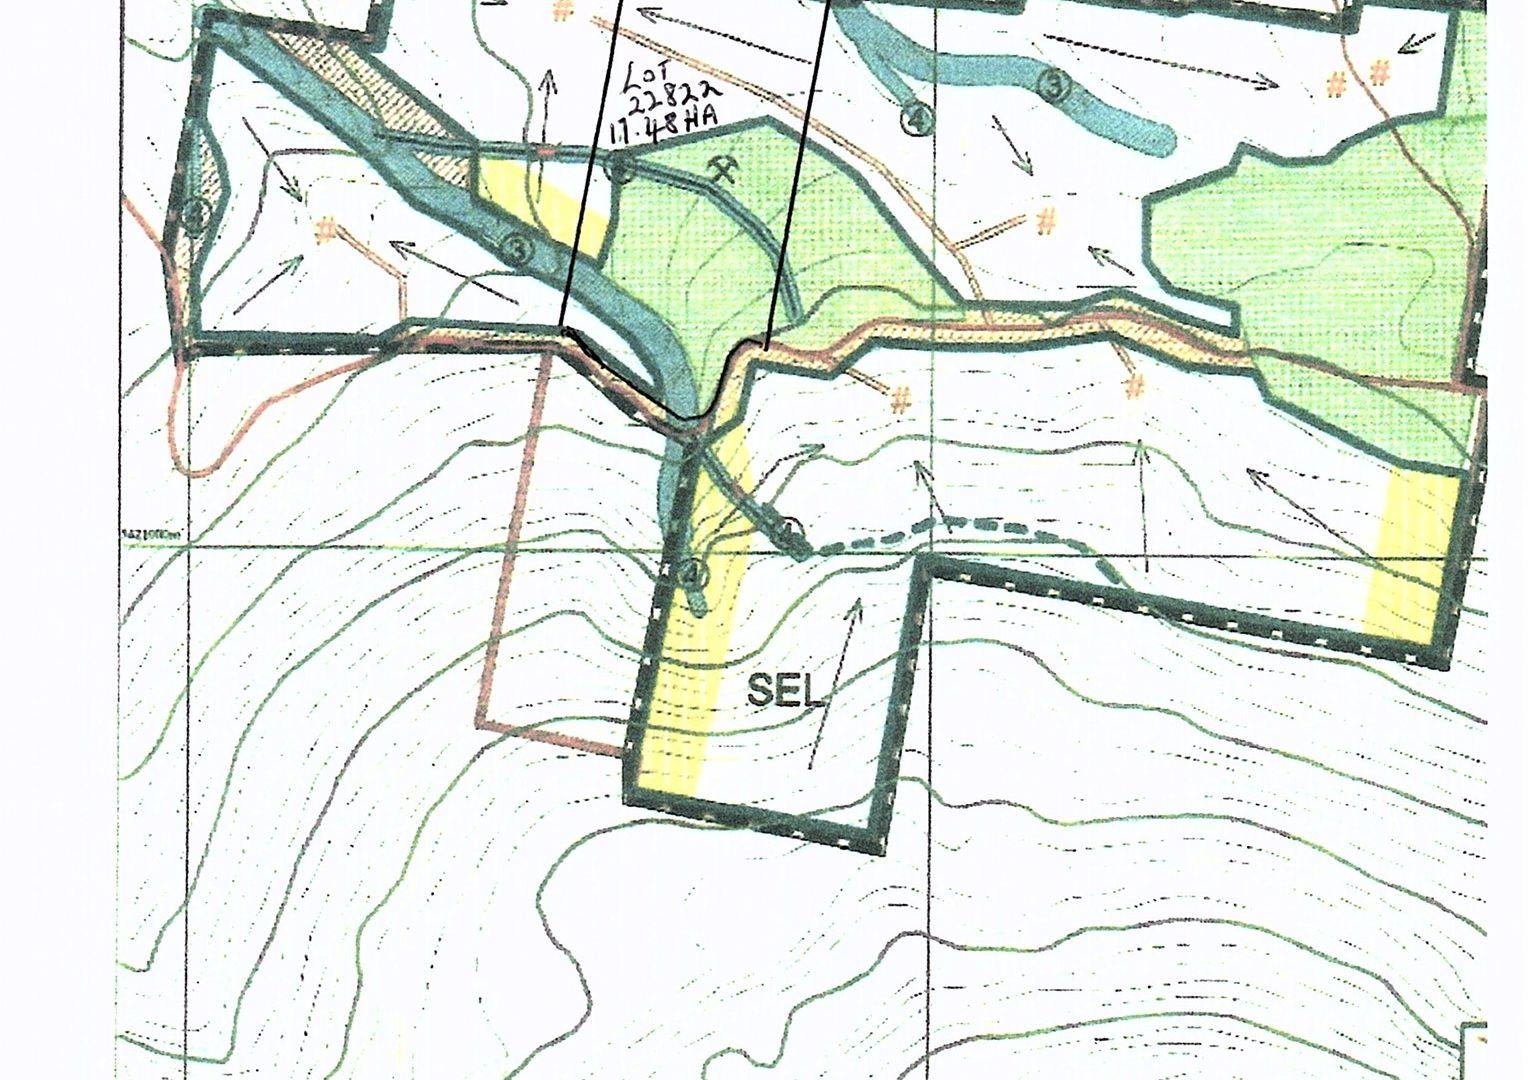 Lot 1/600 Mount Barrow Rd, Nunamara TAS 7259, Image 1